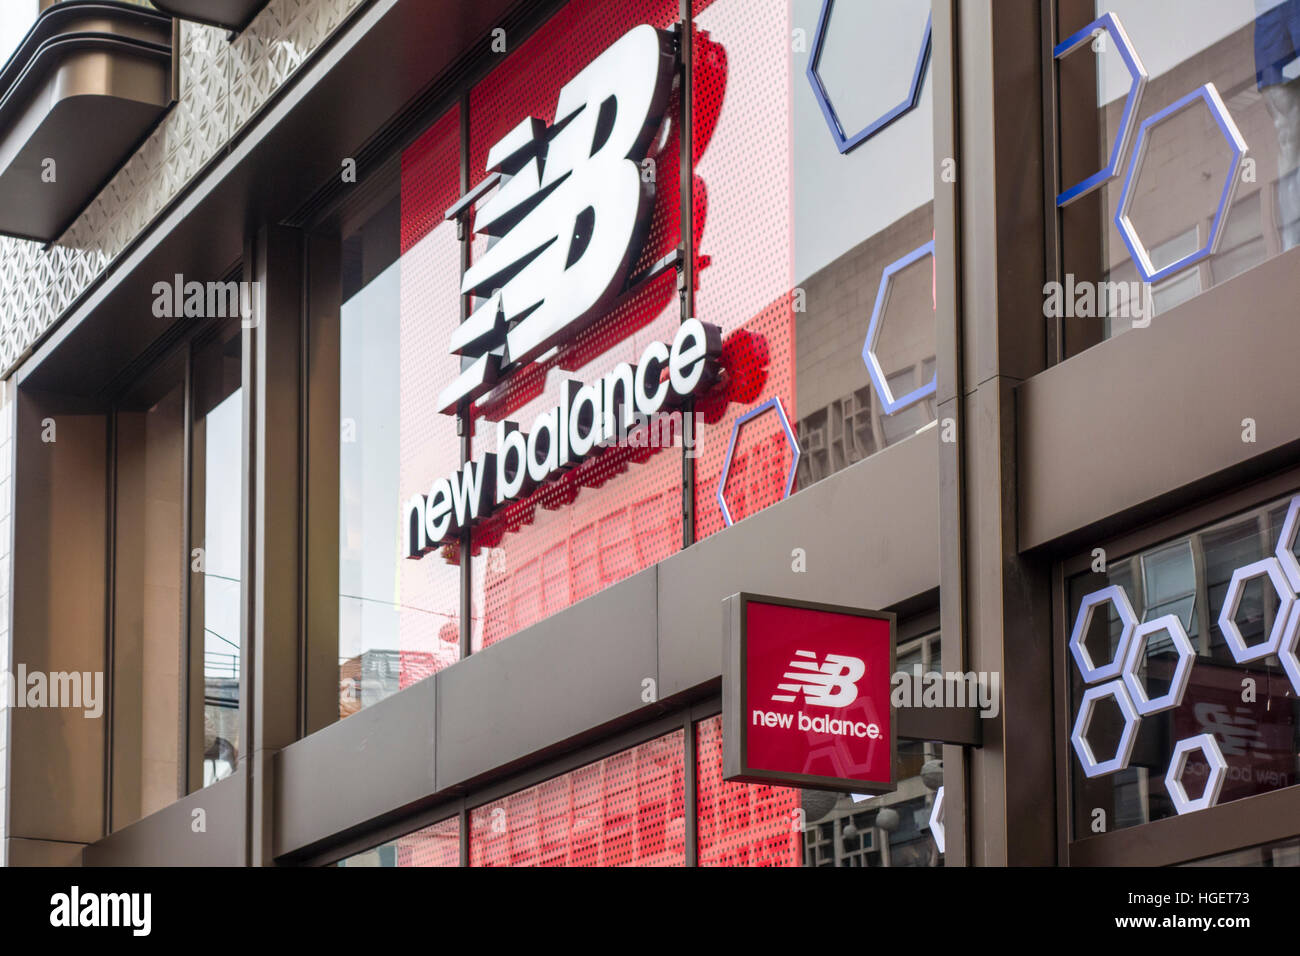 New Balance store shop sign, Oxford Street, London, UK Stock Photo ...